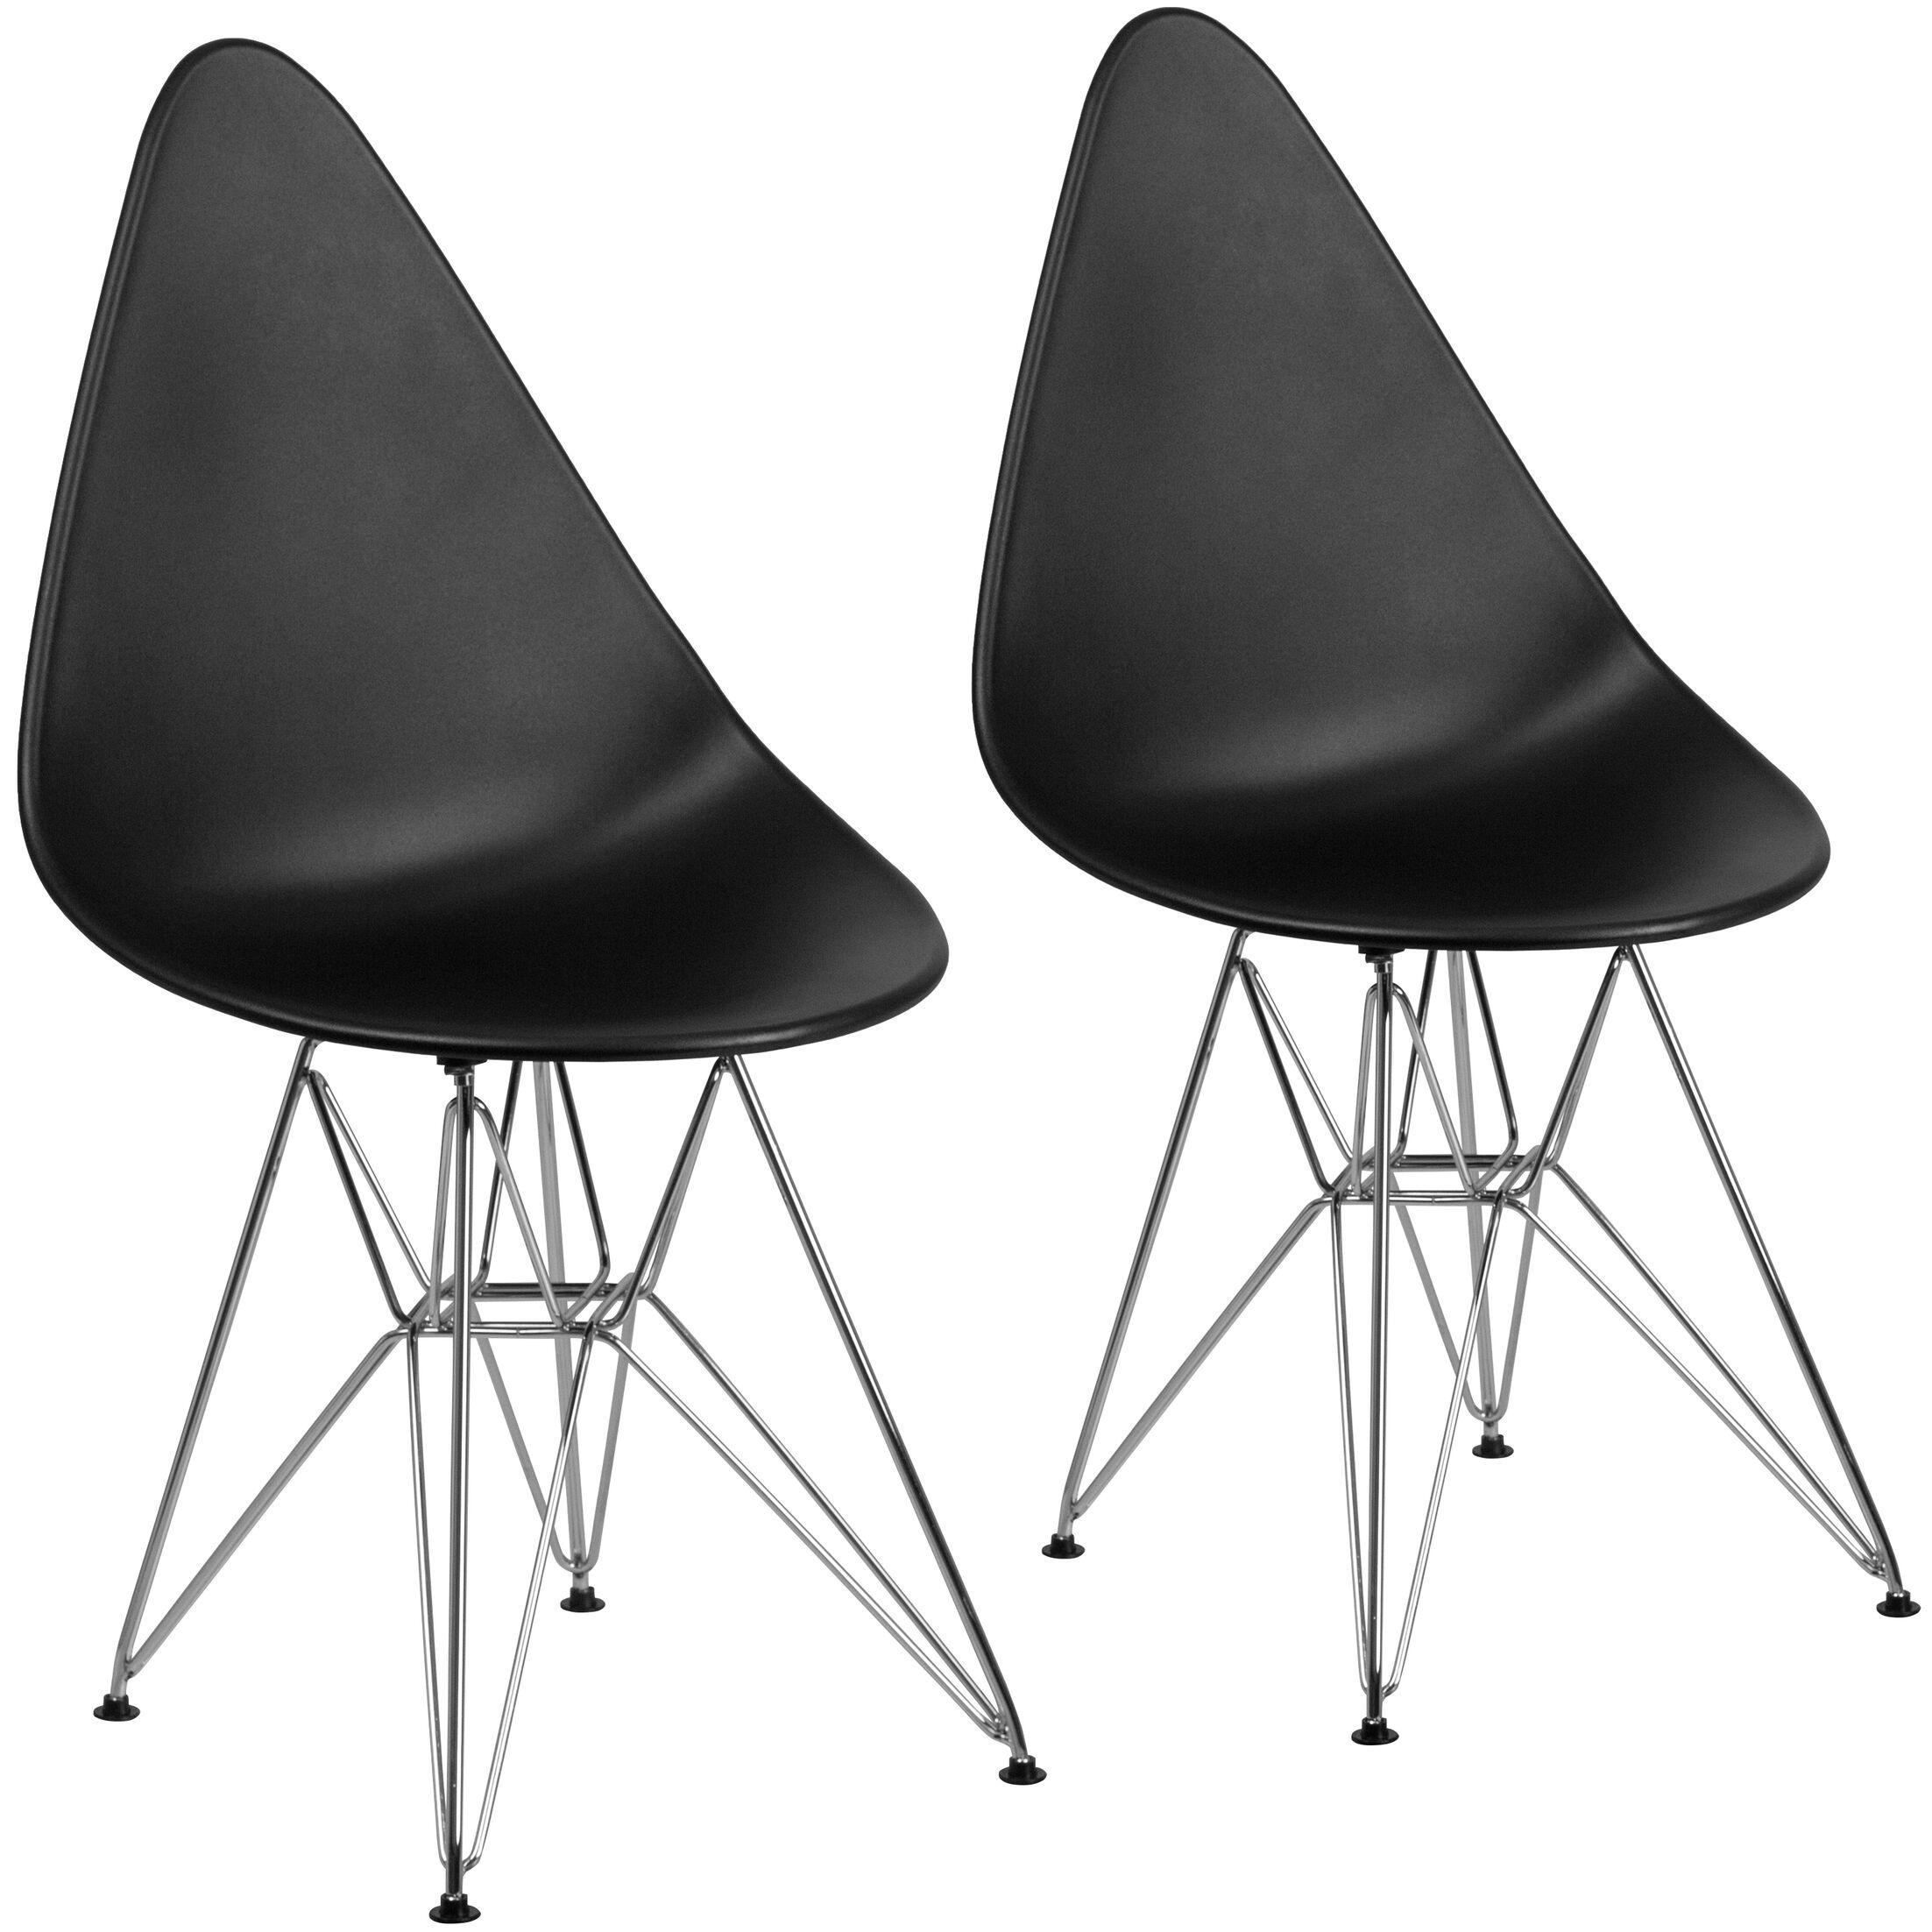 Resto Guest Chair Seat Color: Black